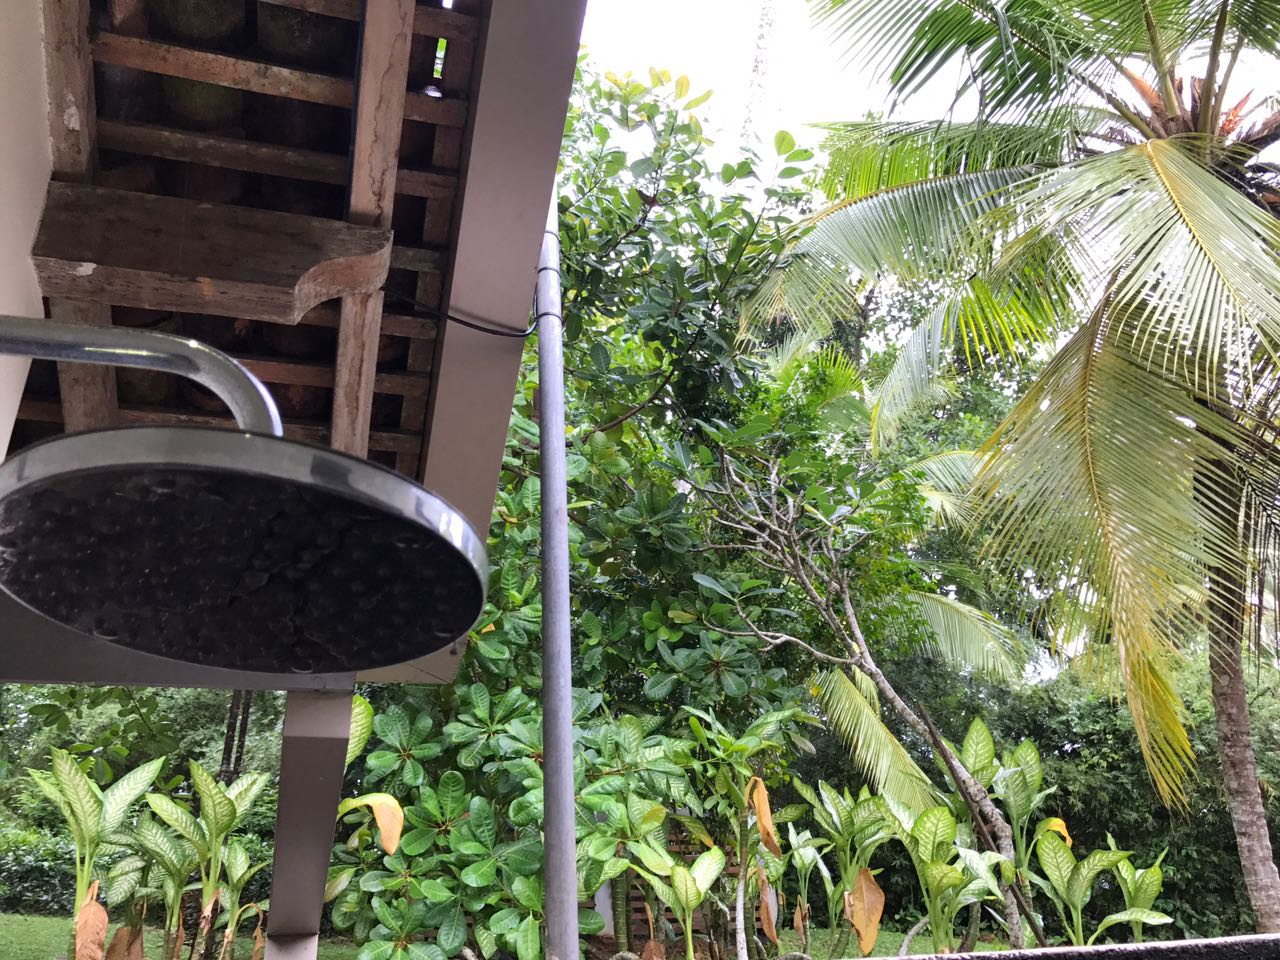 Outdoor shower - tropical modernism